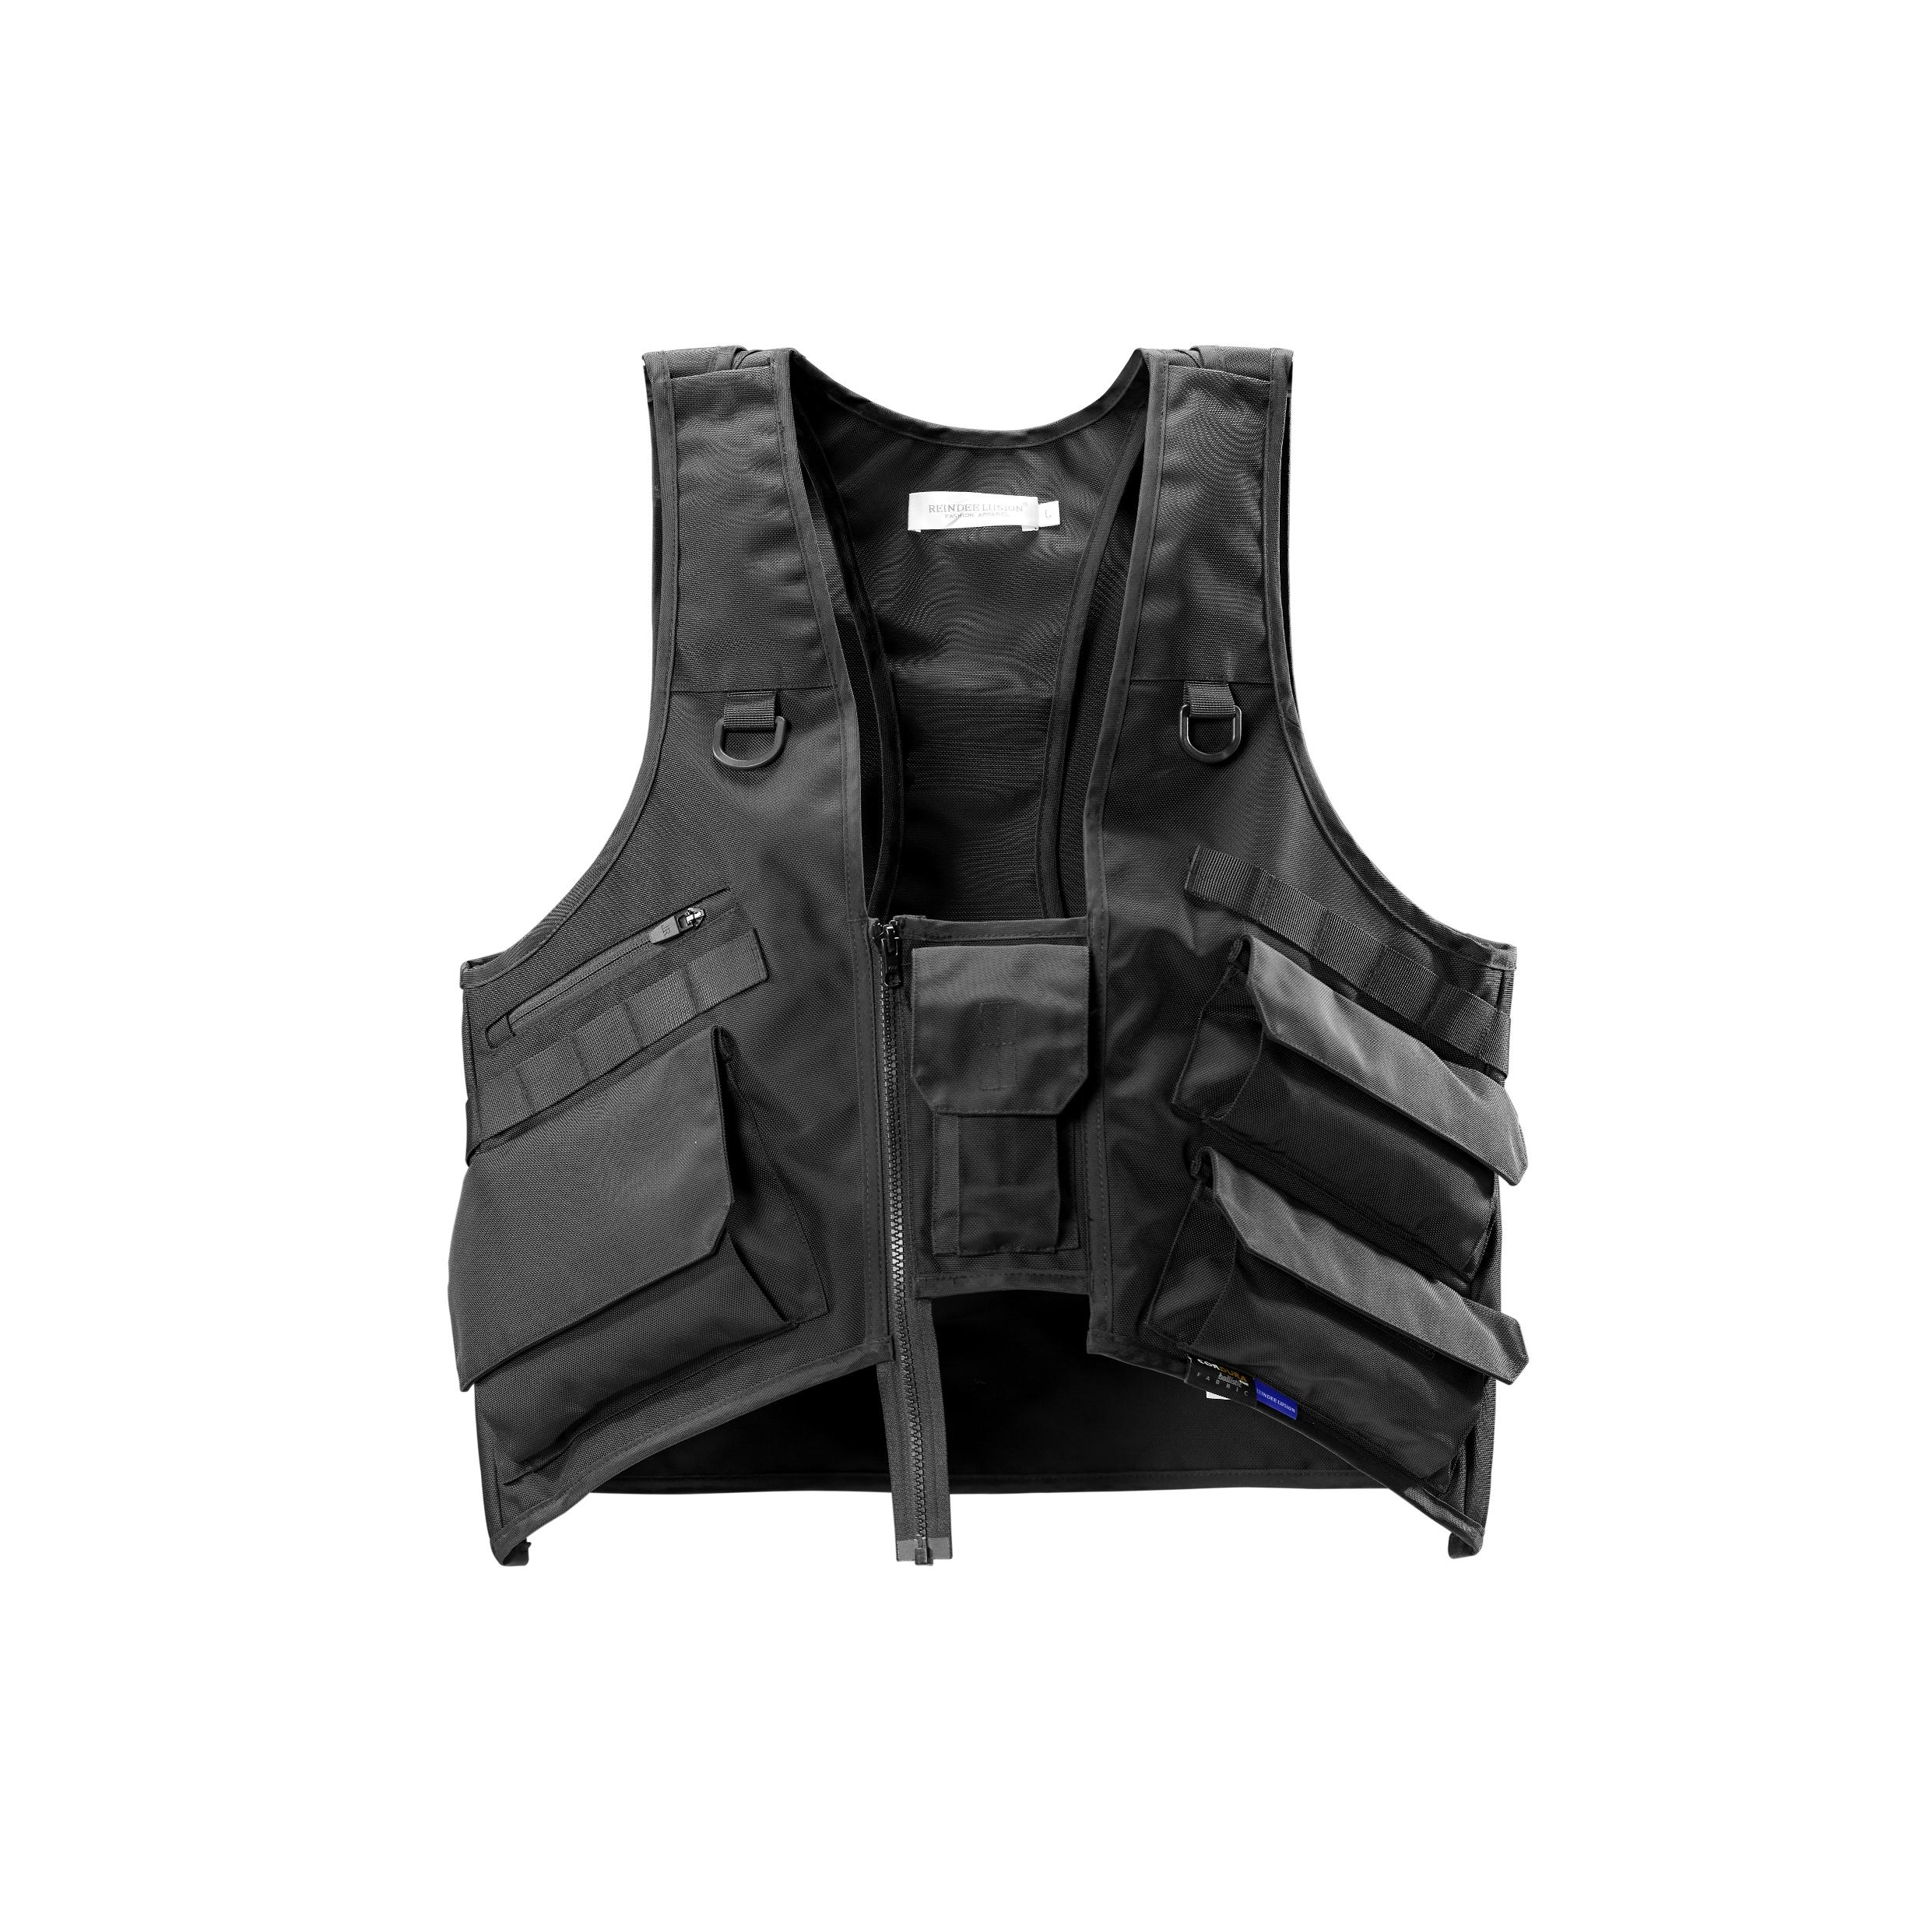 RL | REINDEE LUSION 19S/S 立体U形剪裁多口袋功能马甲